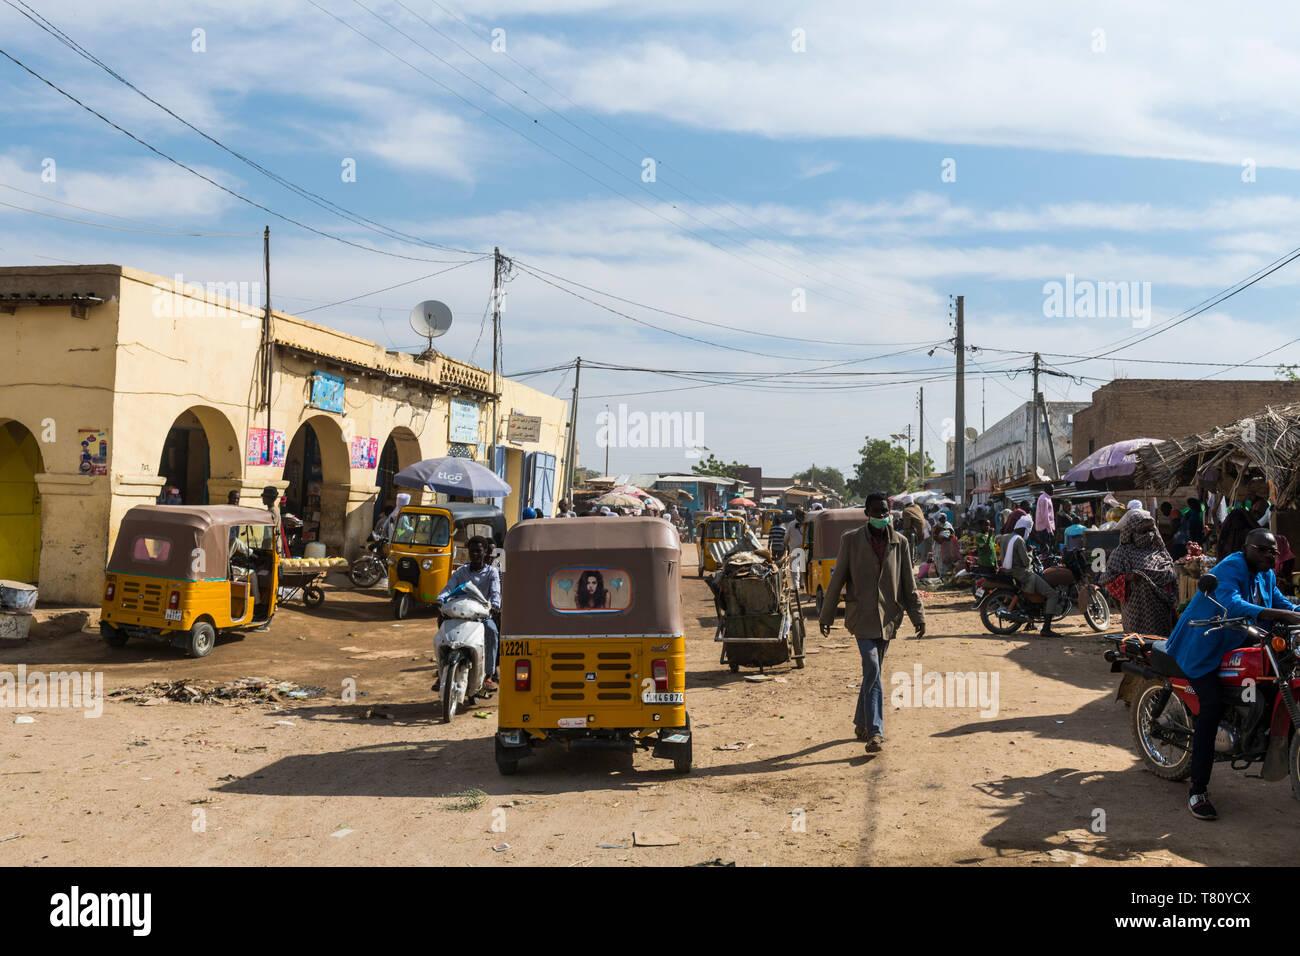 Market scene, Abeche, Chad, Africa - Stock Image